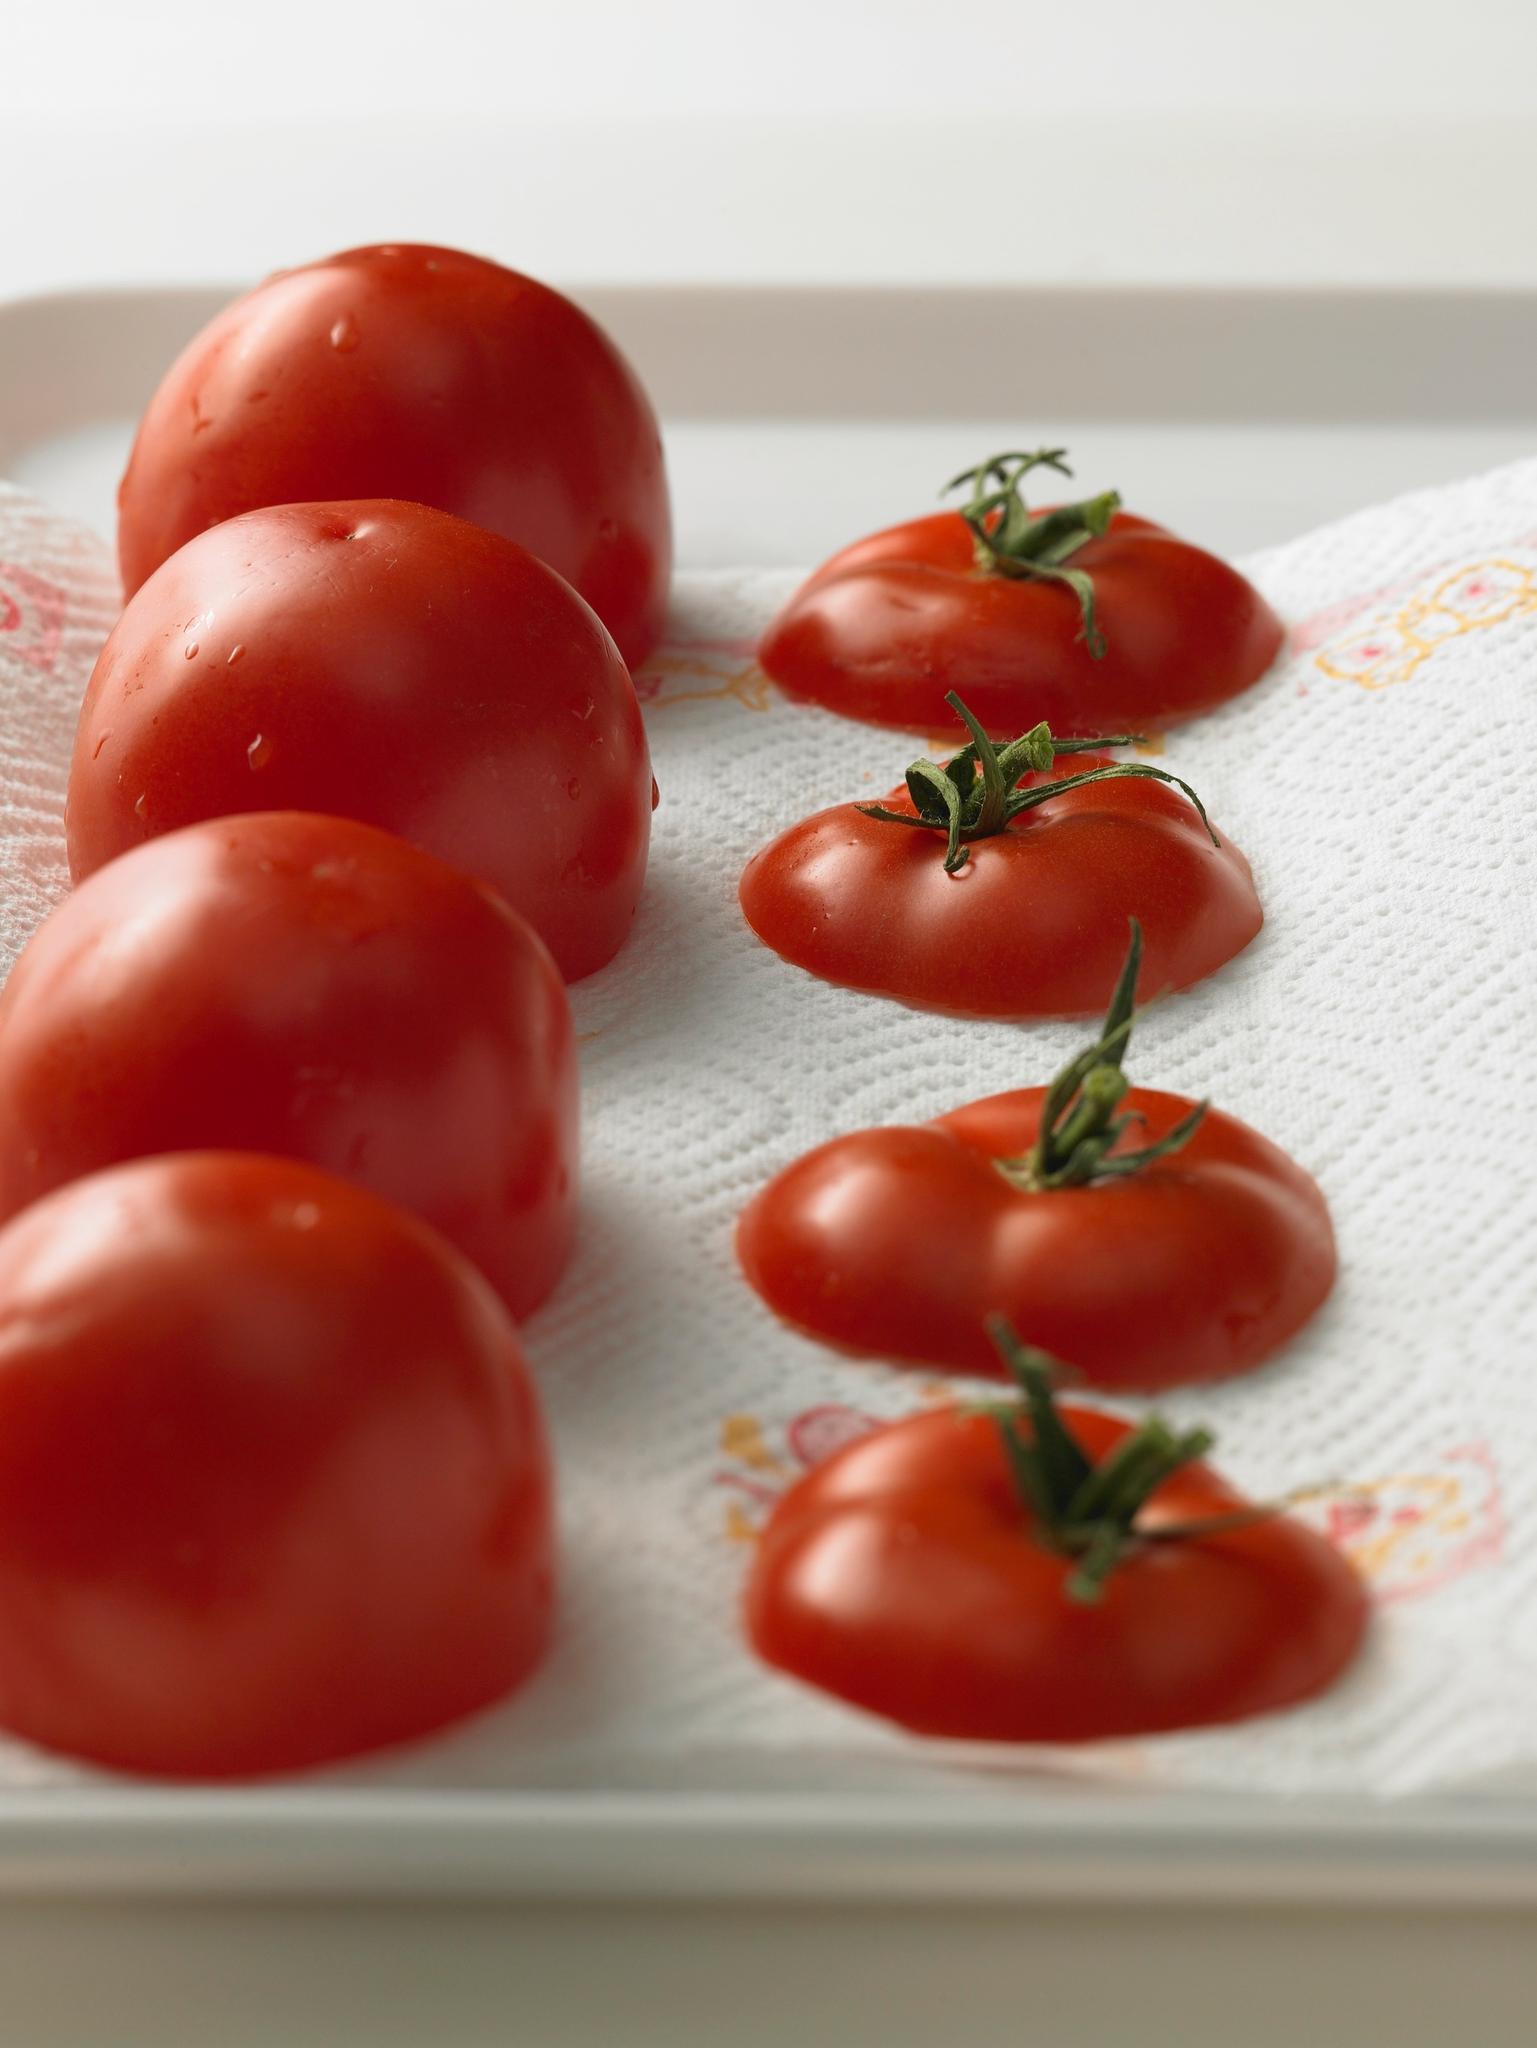 tomaten aush hlen so geht 39 s step by step. Black Bedroom Furniture Sets. Home Design Ideas